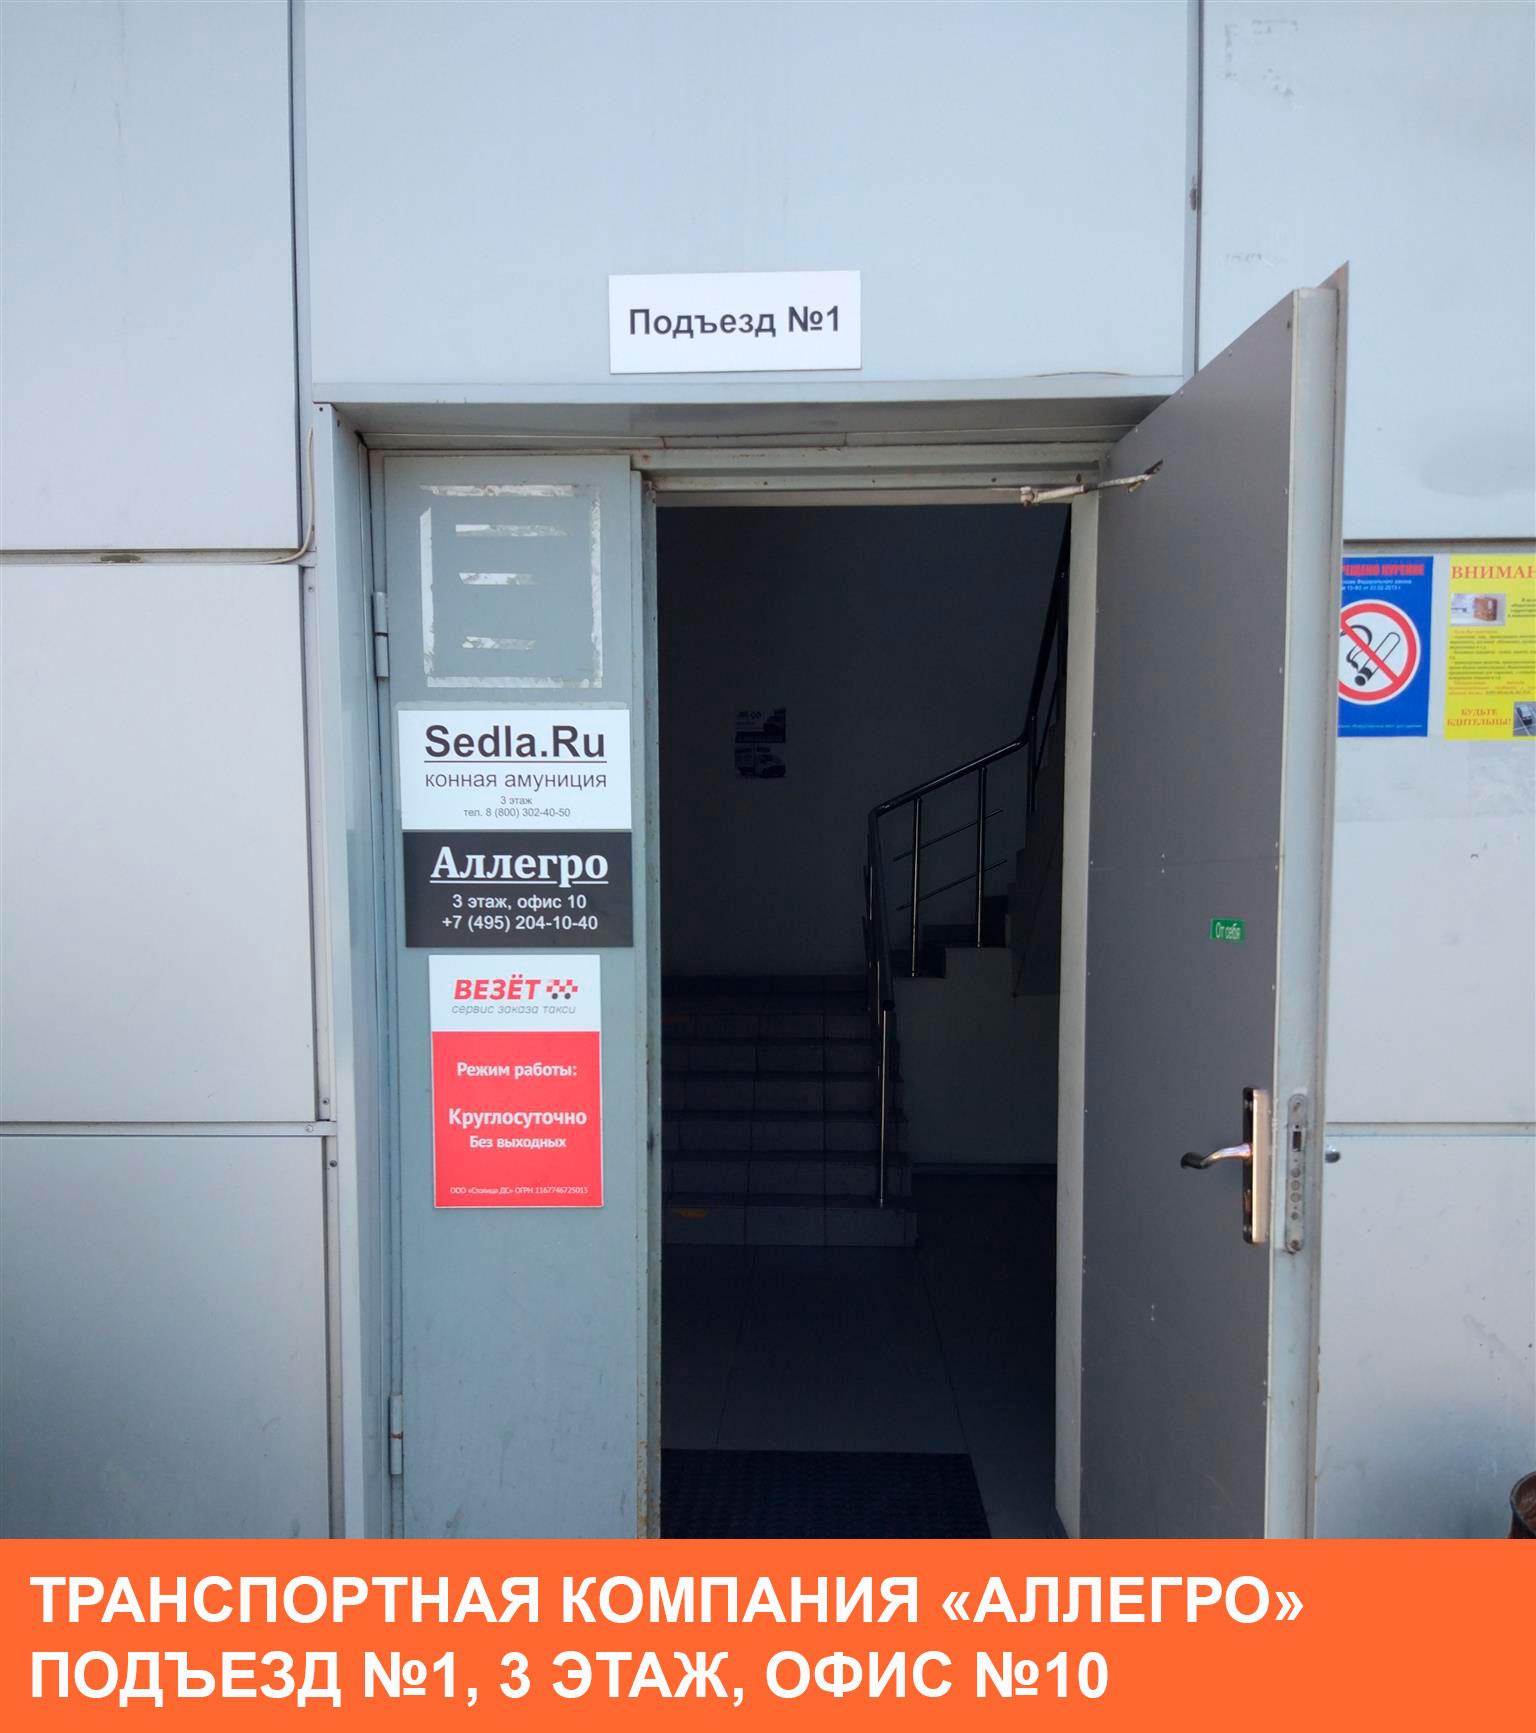 path2 7 - Контакты транспортной компании Аллегро